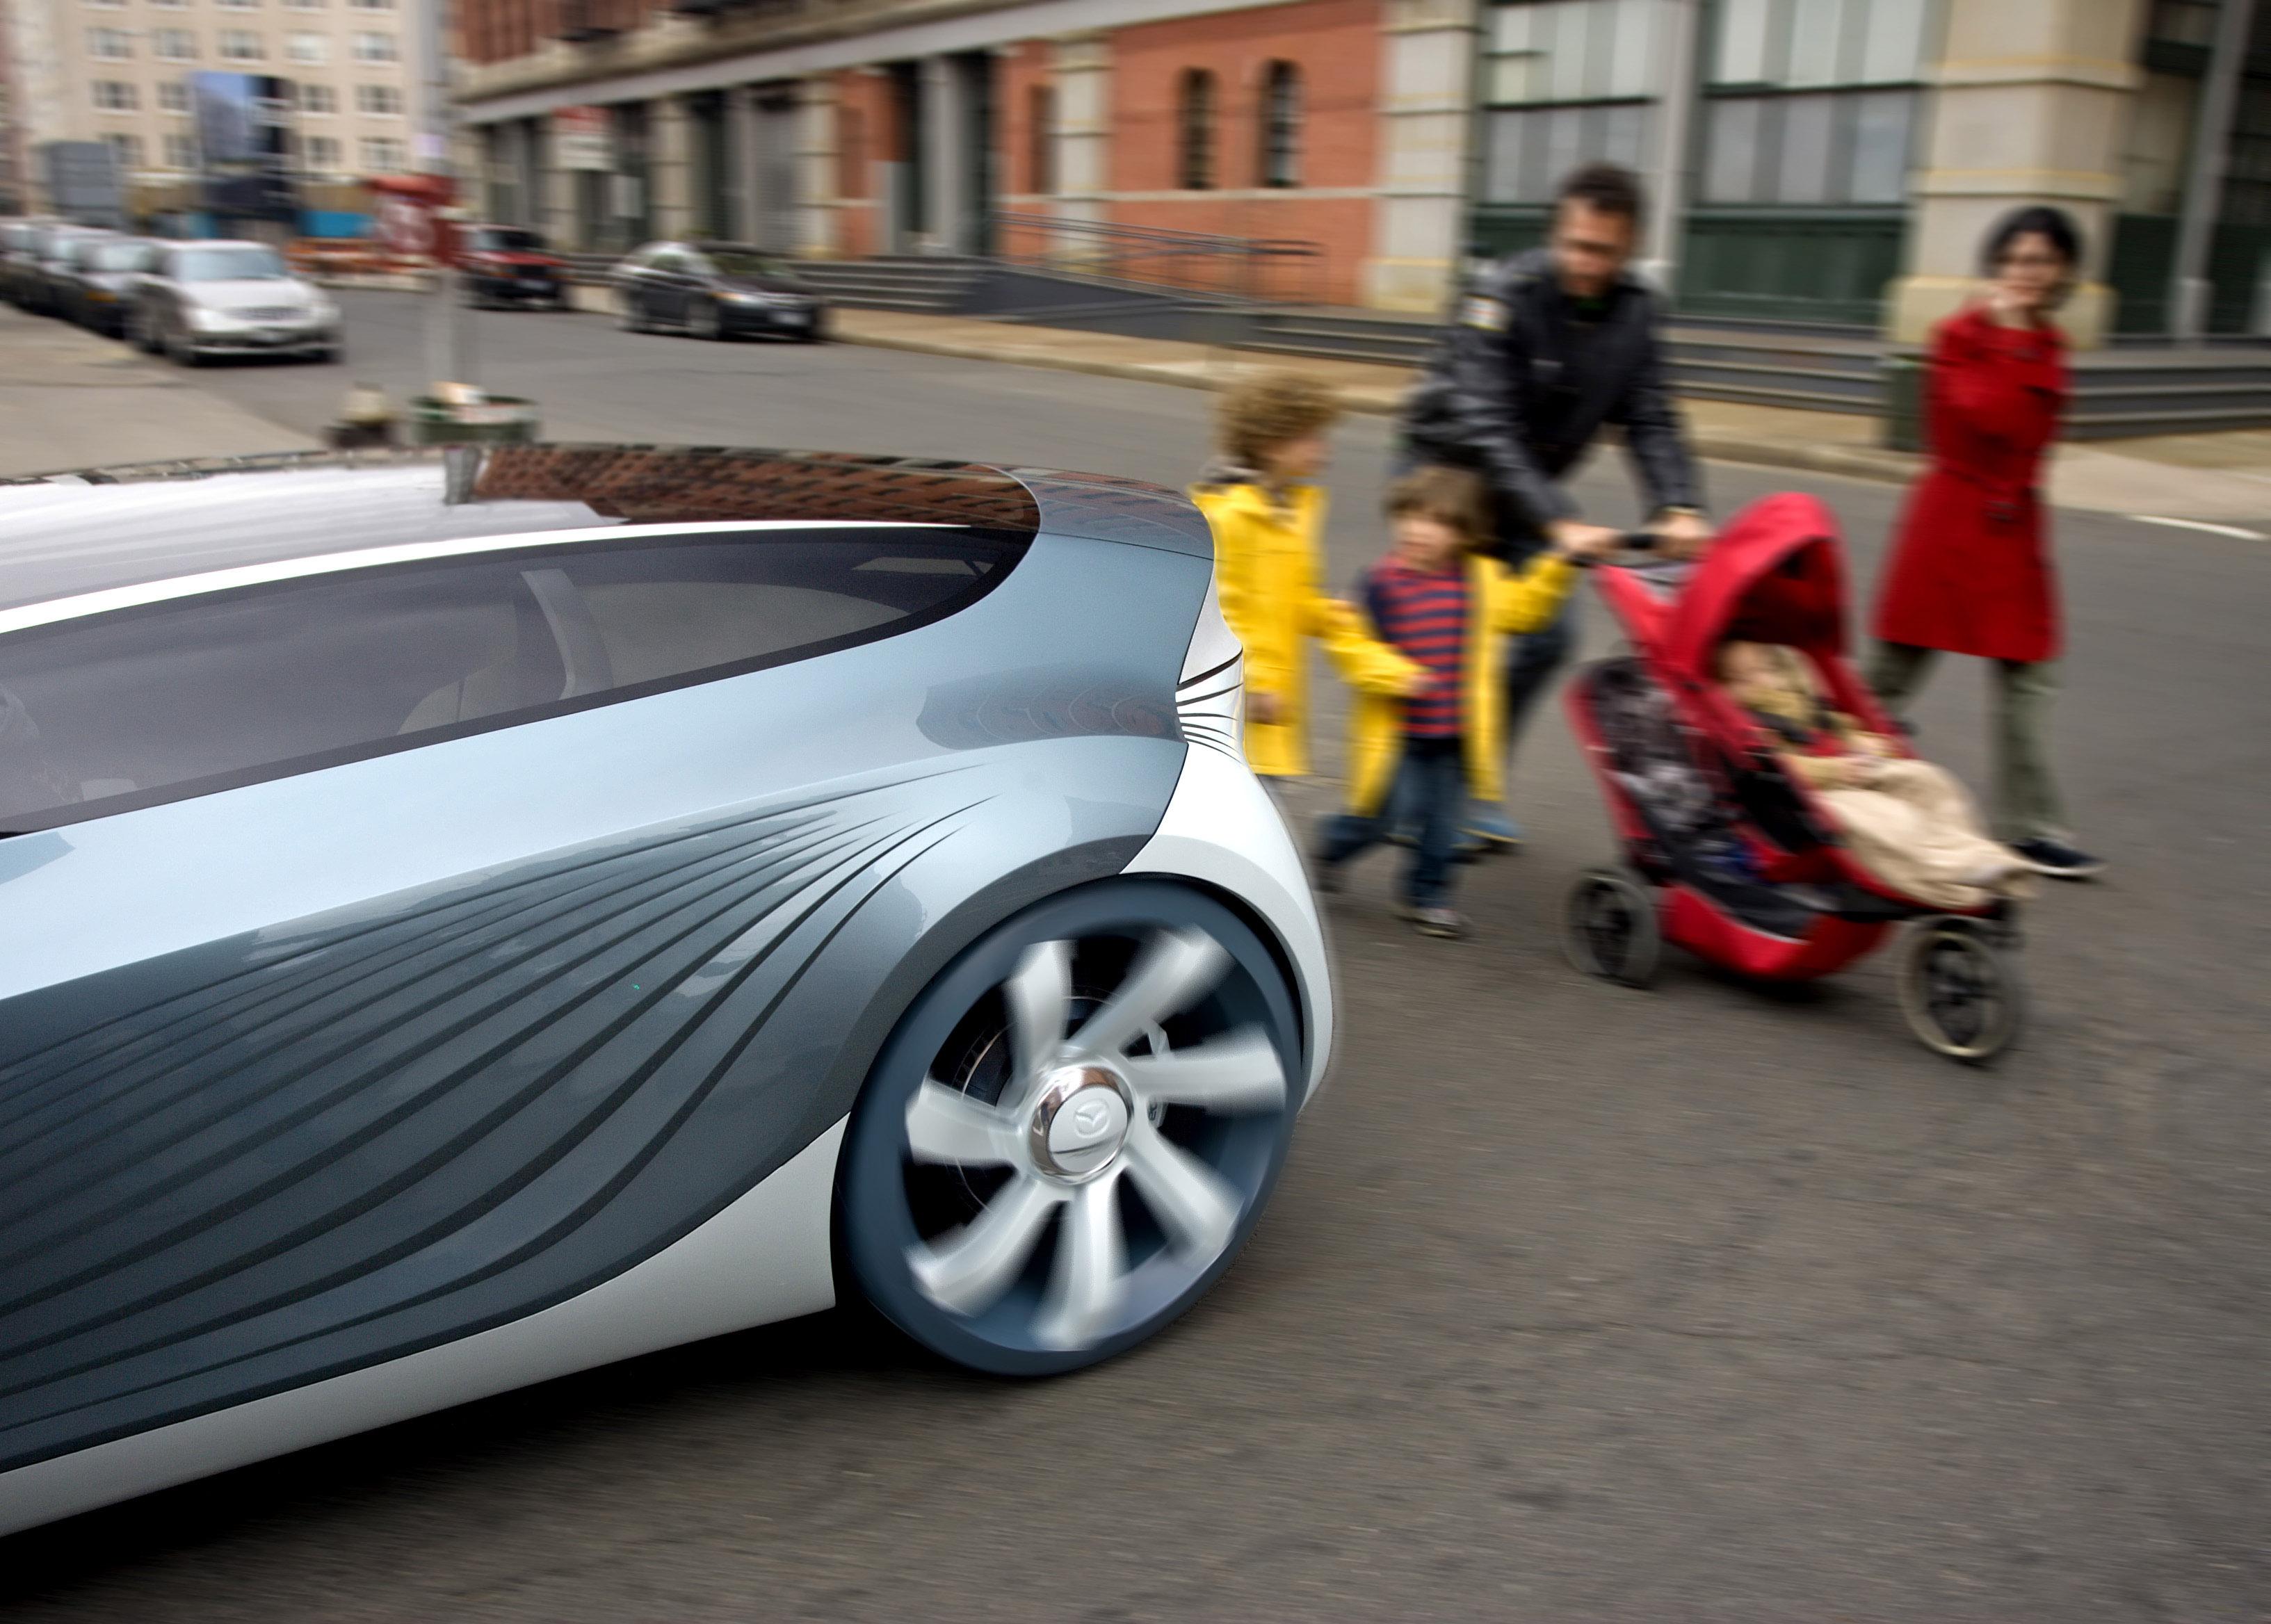 https://www.automobilesreview.com/gallery/mazda-nagare-concept/mazda-nagare-concept-04.jpg